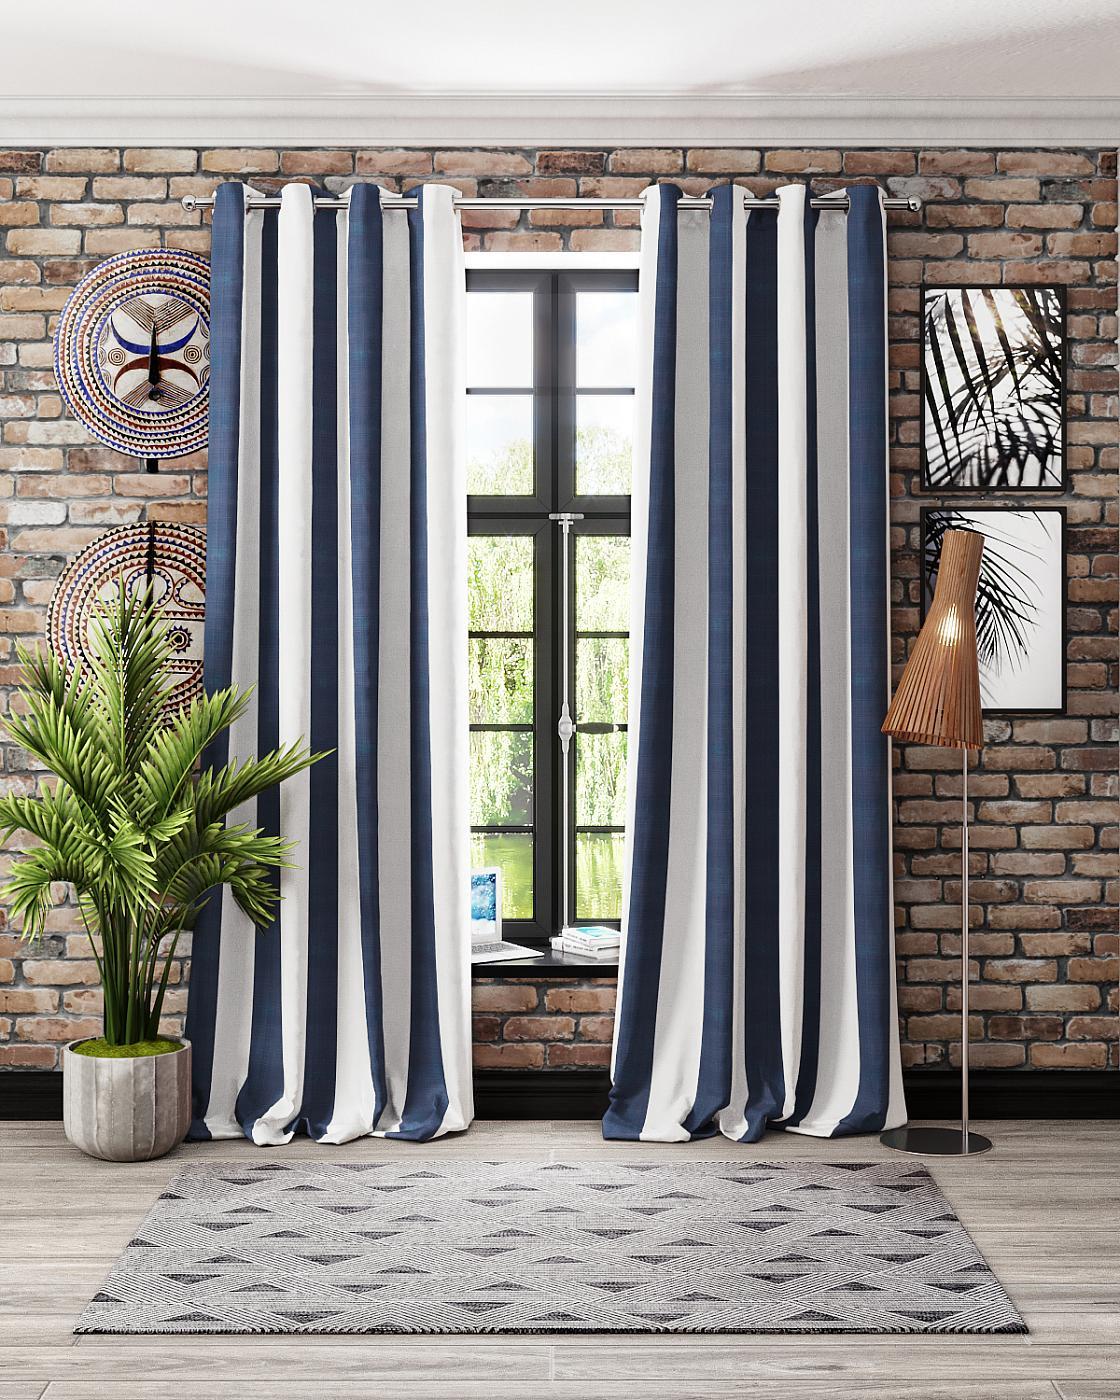 Комплект штор Томдом Биттл, белый, синий полотенце томдом самдель синий